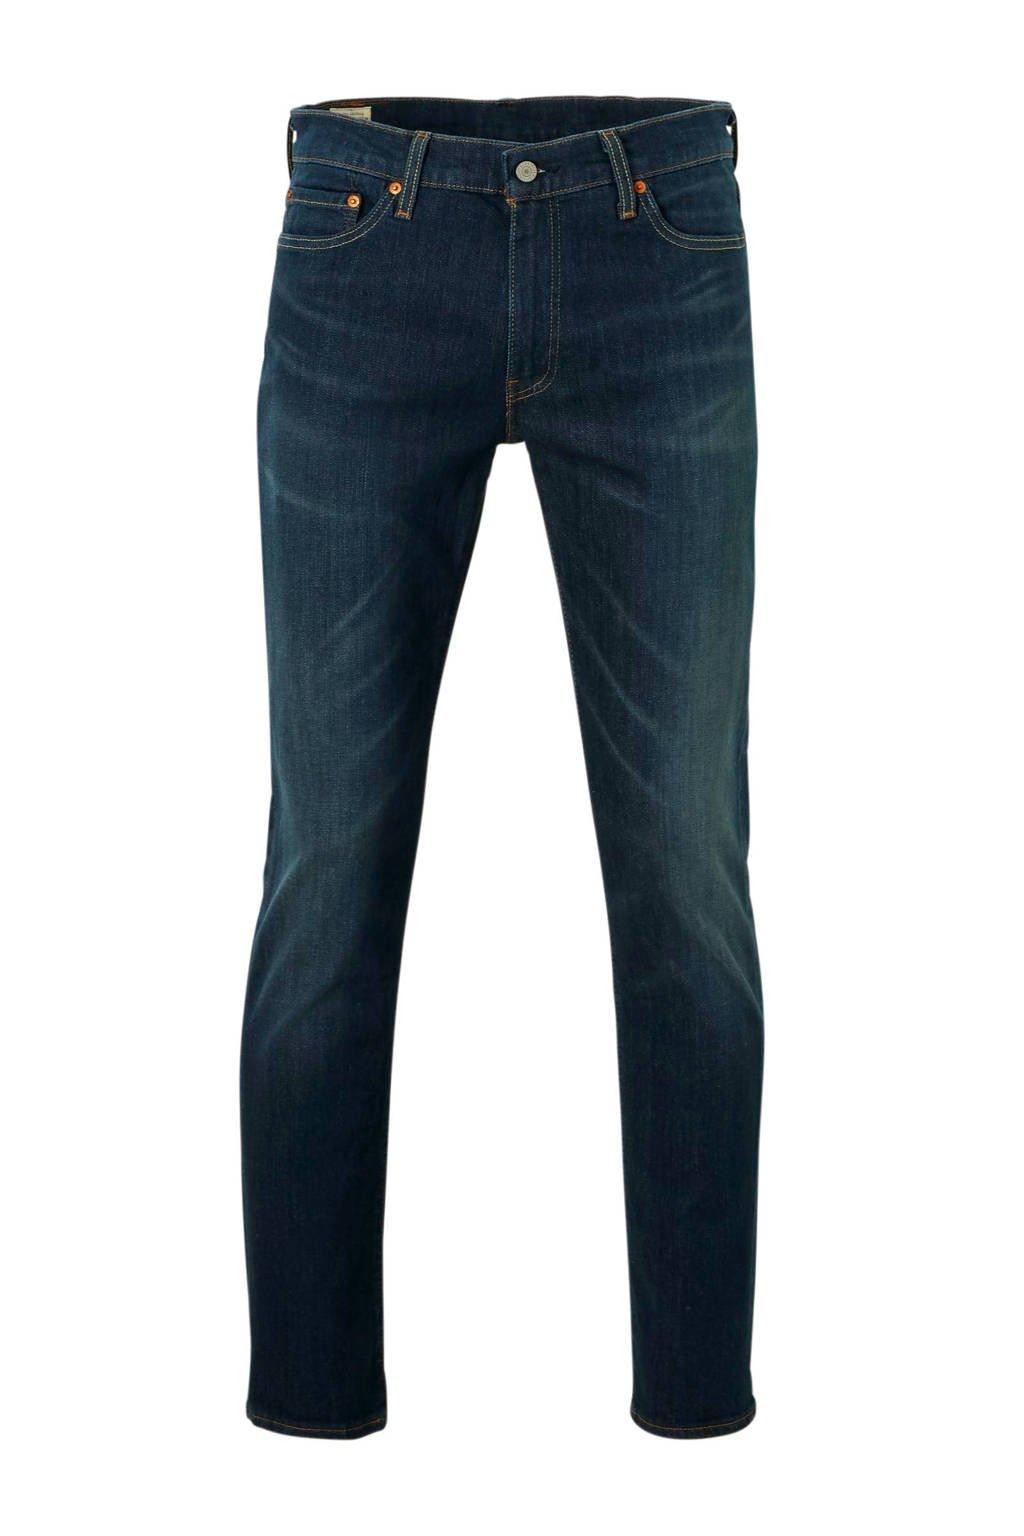 Levi's 511 slim fit jeans, Blauw